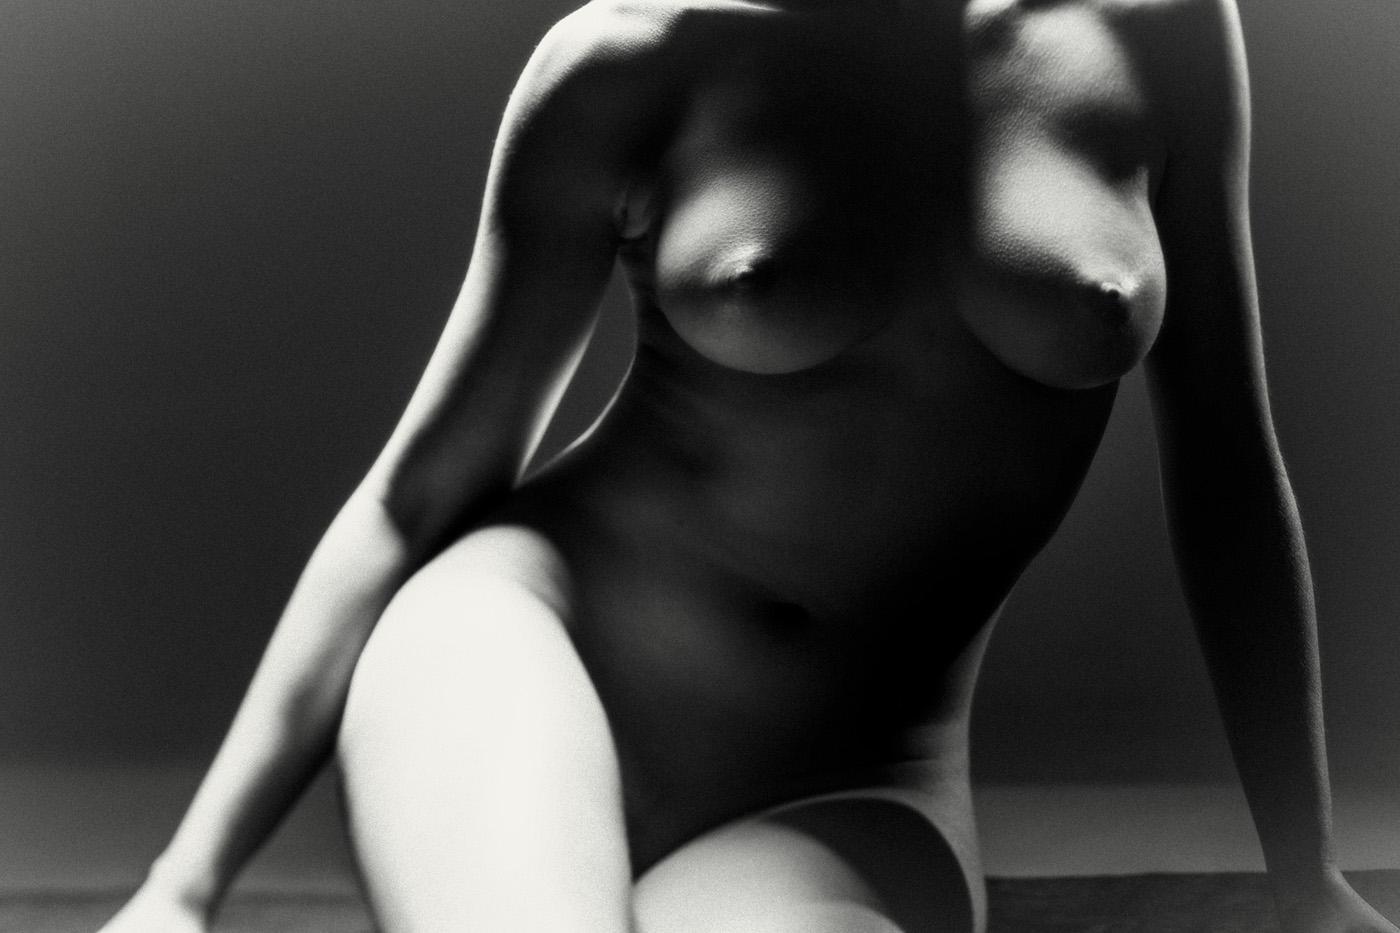 fine art nude photography of women. Beautiful  art nude prints for sale